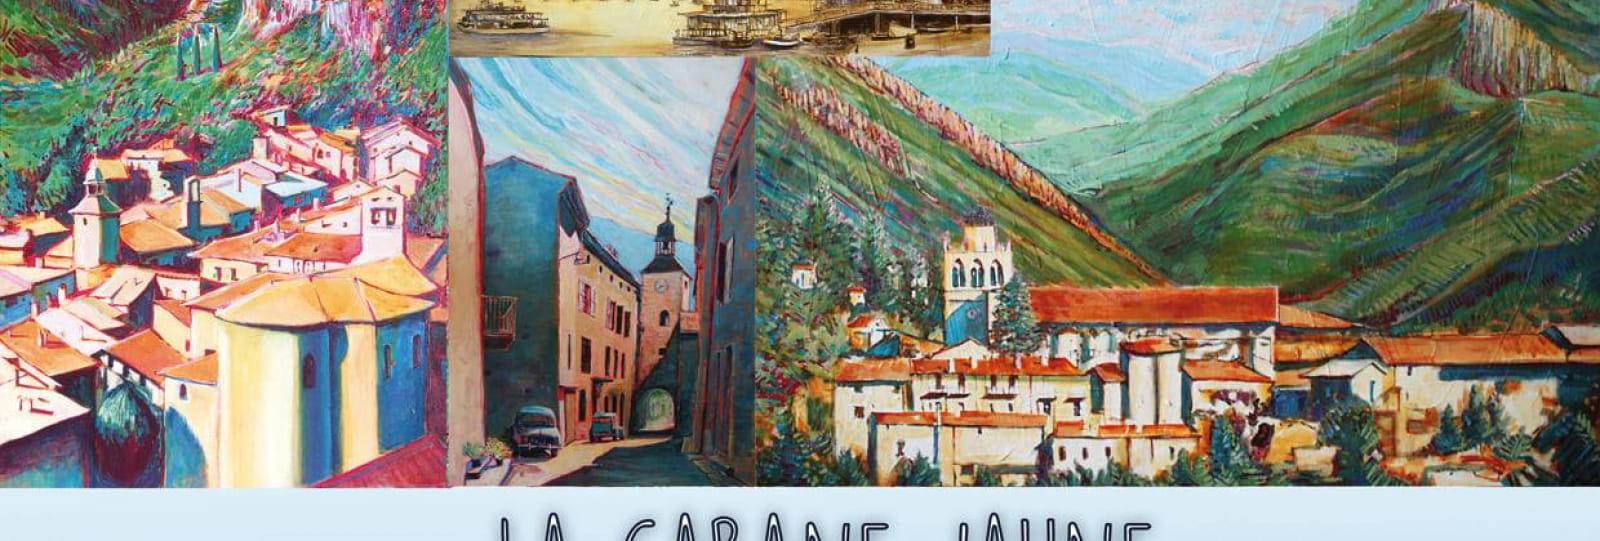 Atelier - La Cabane Jaune - Perspective